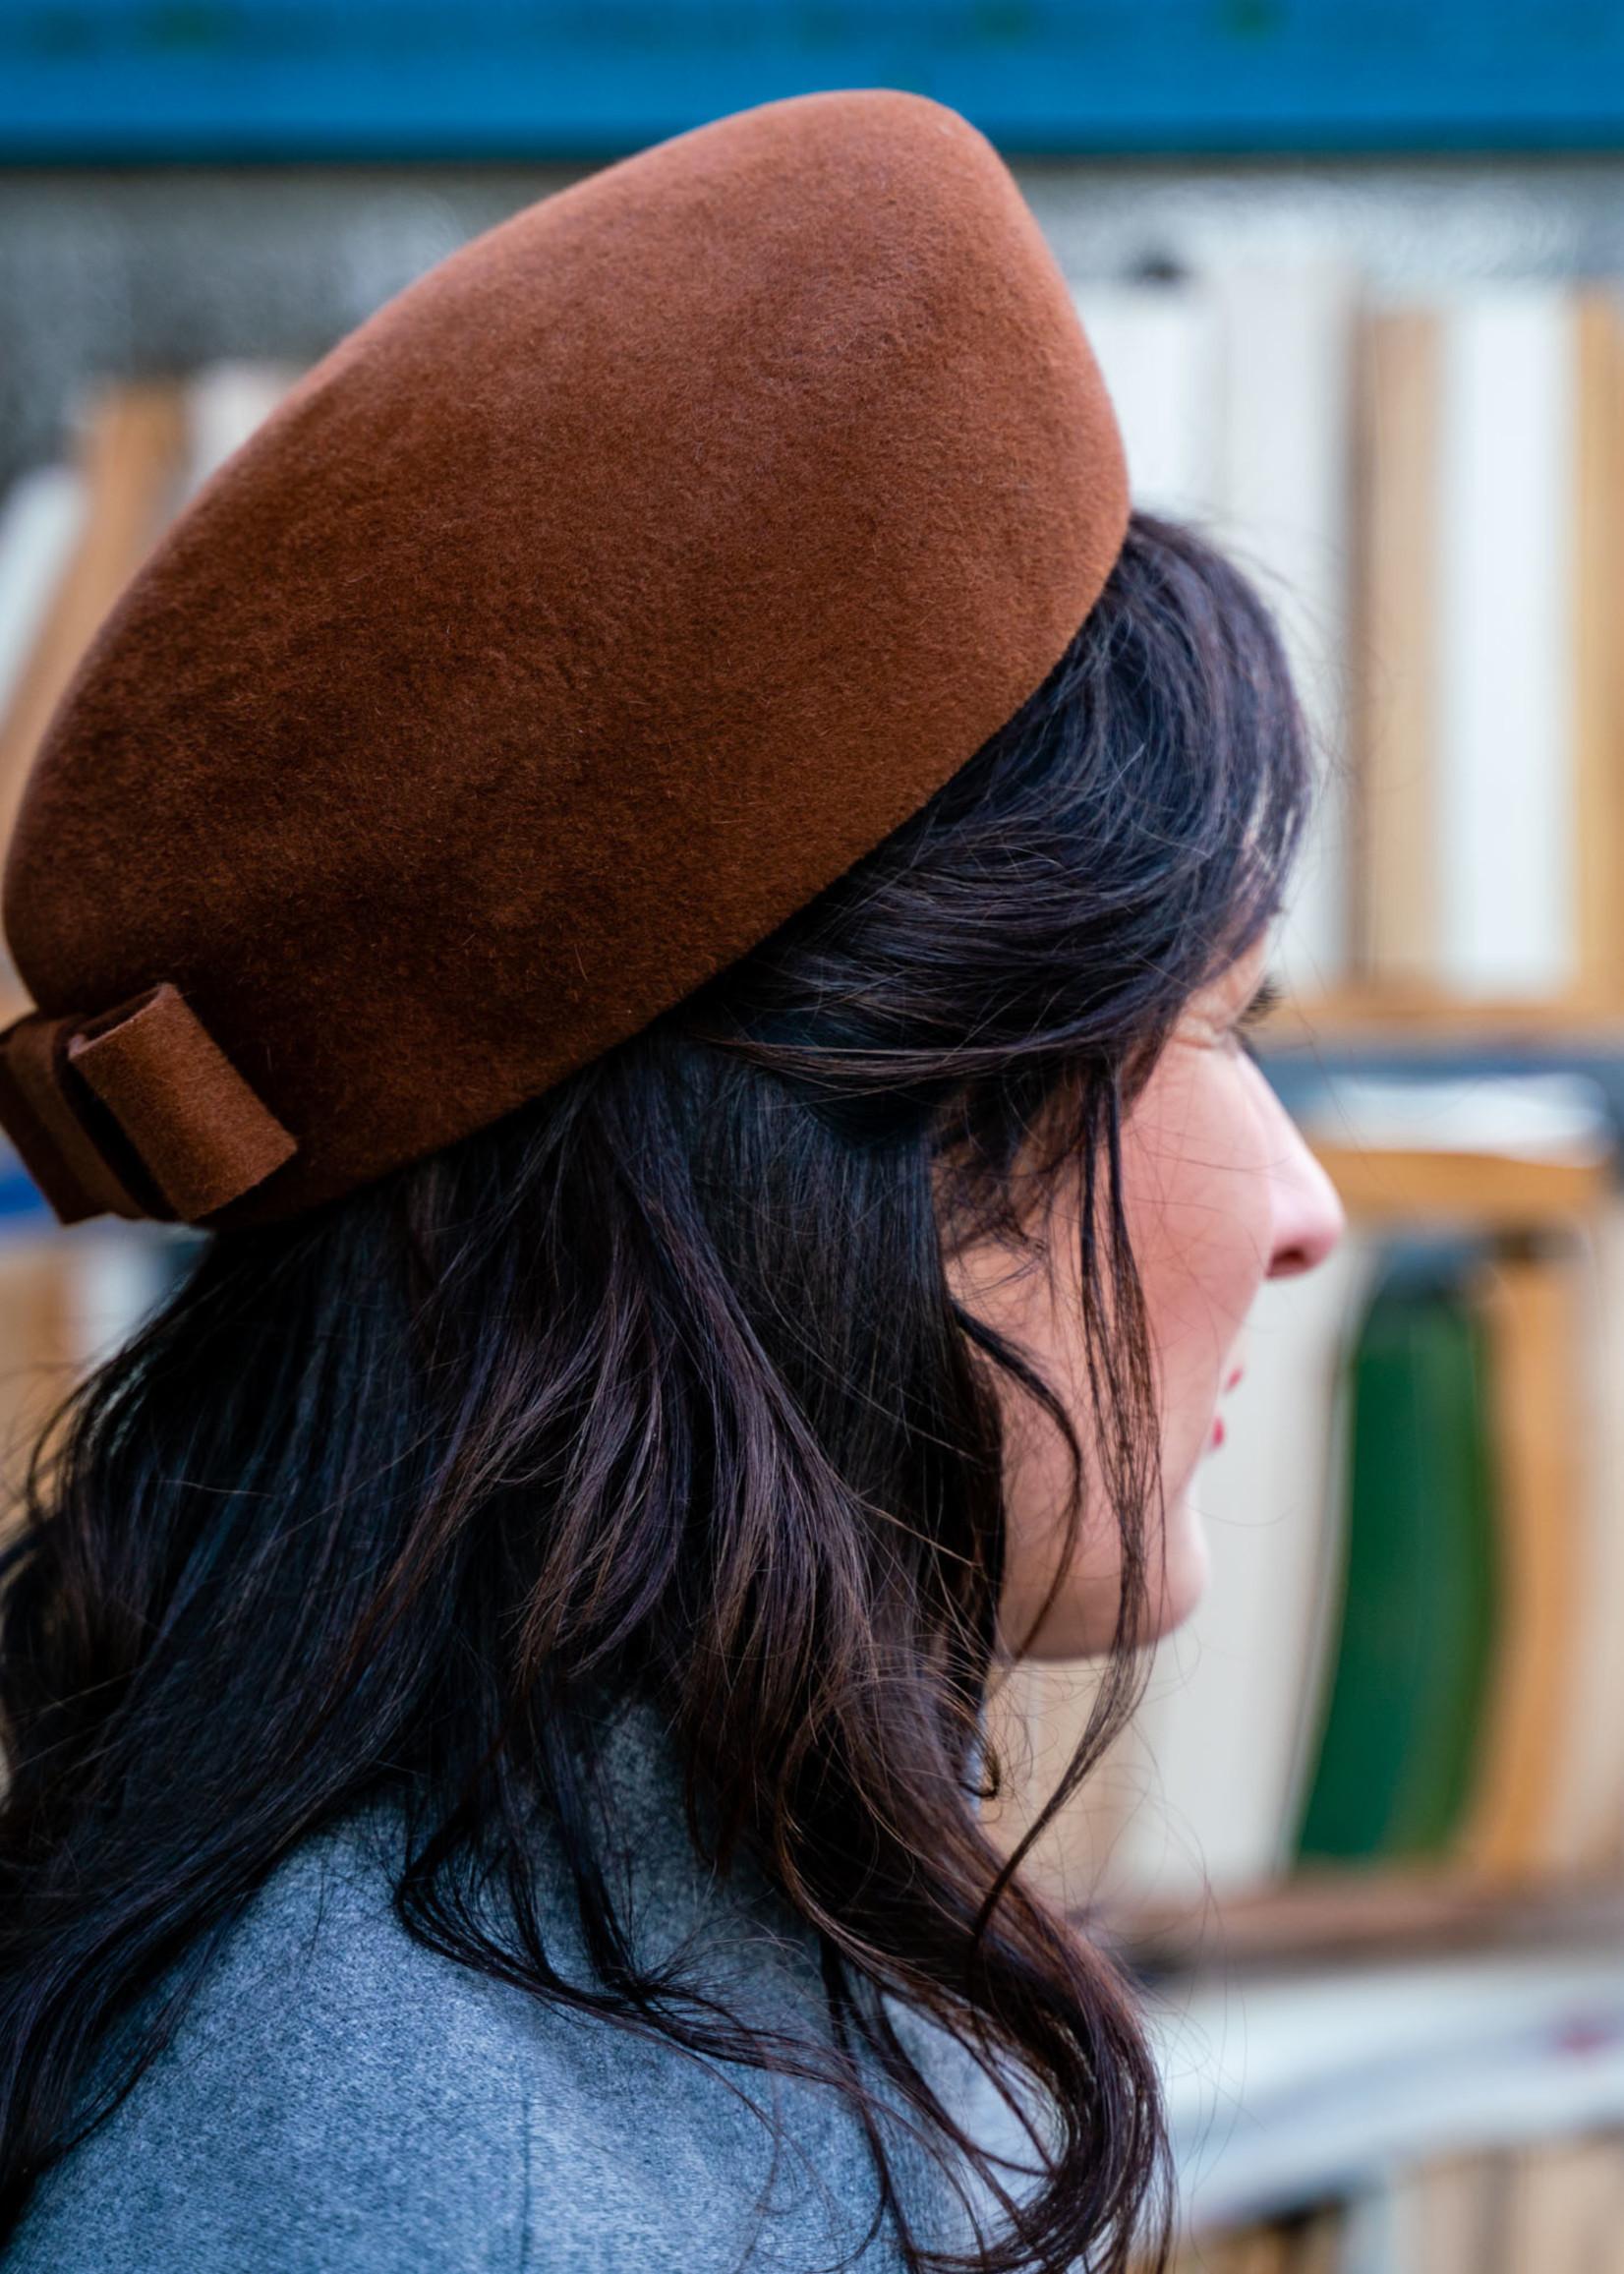 AVA Hattitude London - Vrouwelijk Warm bruin